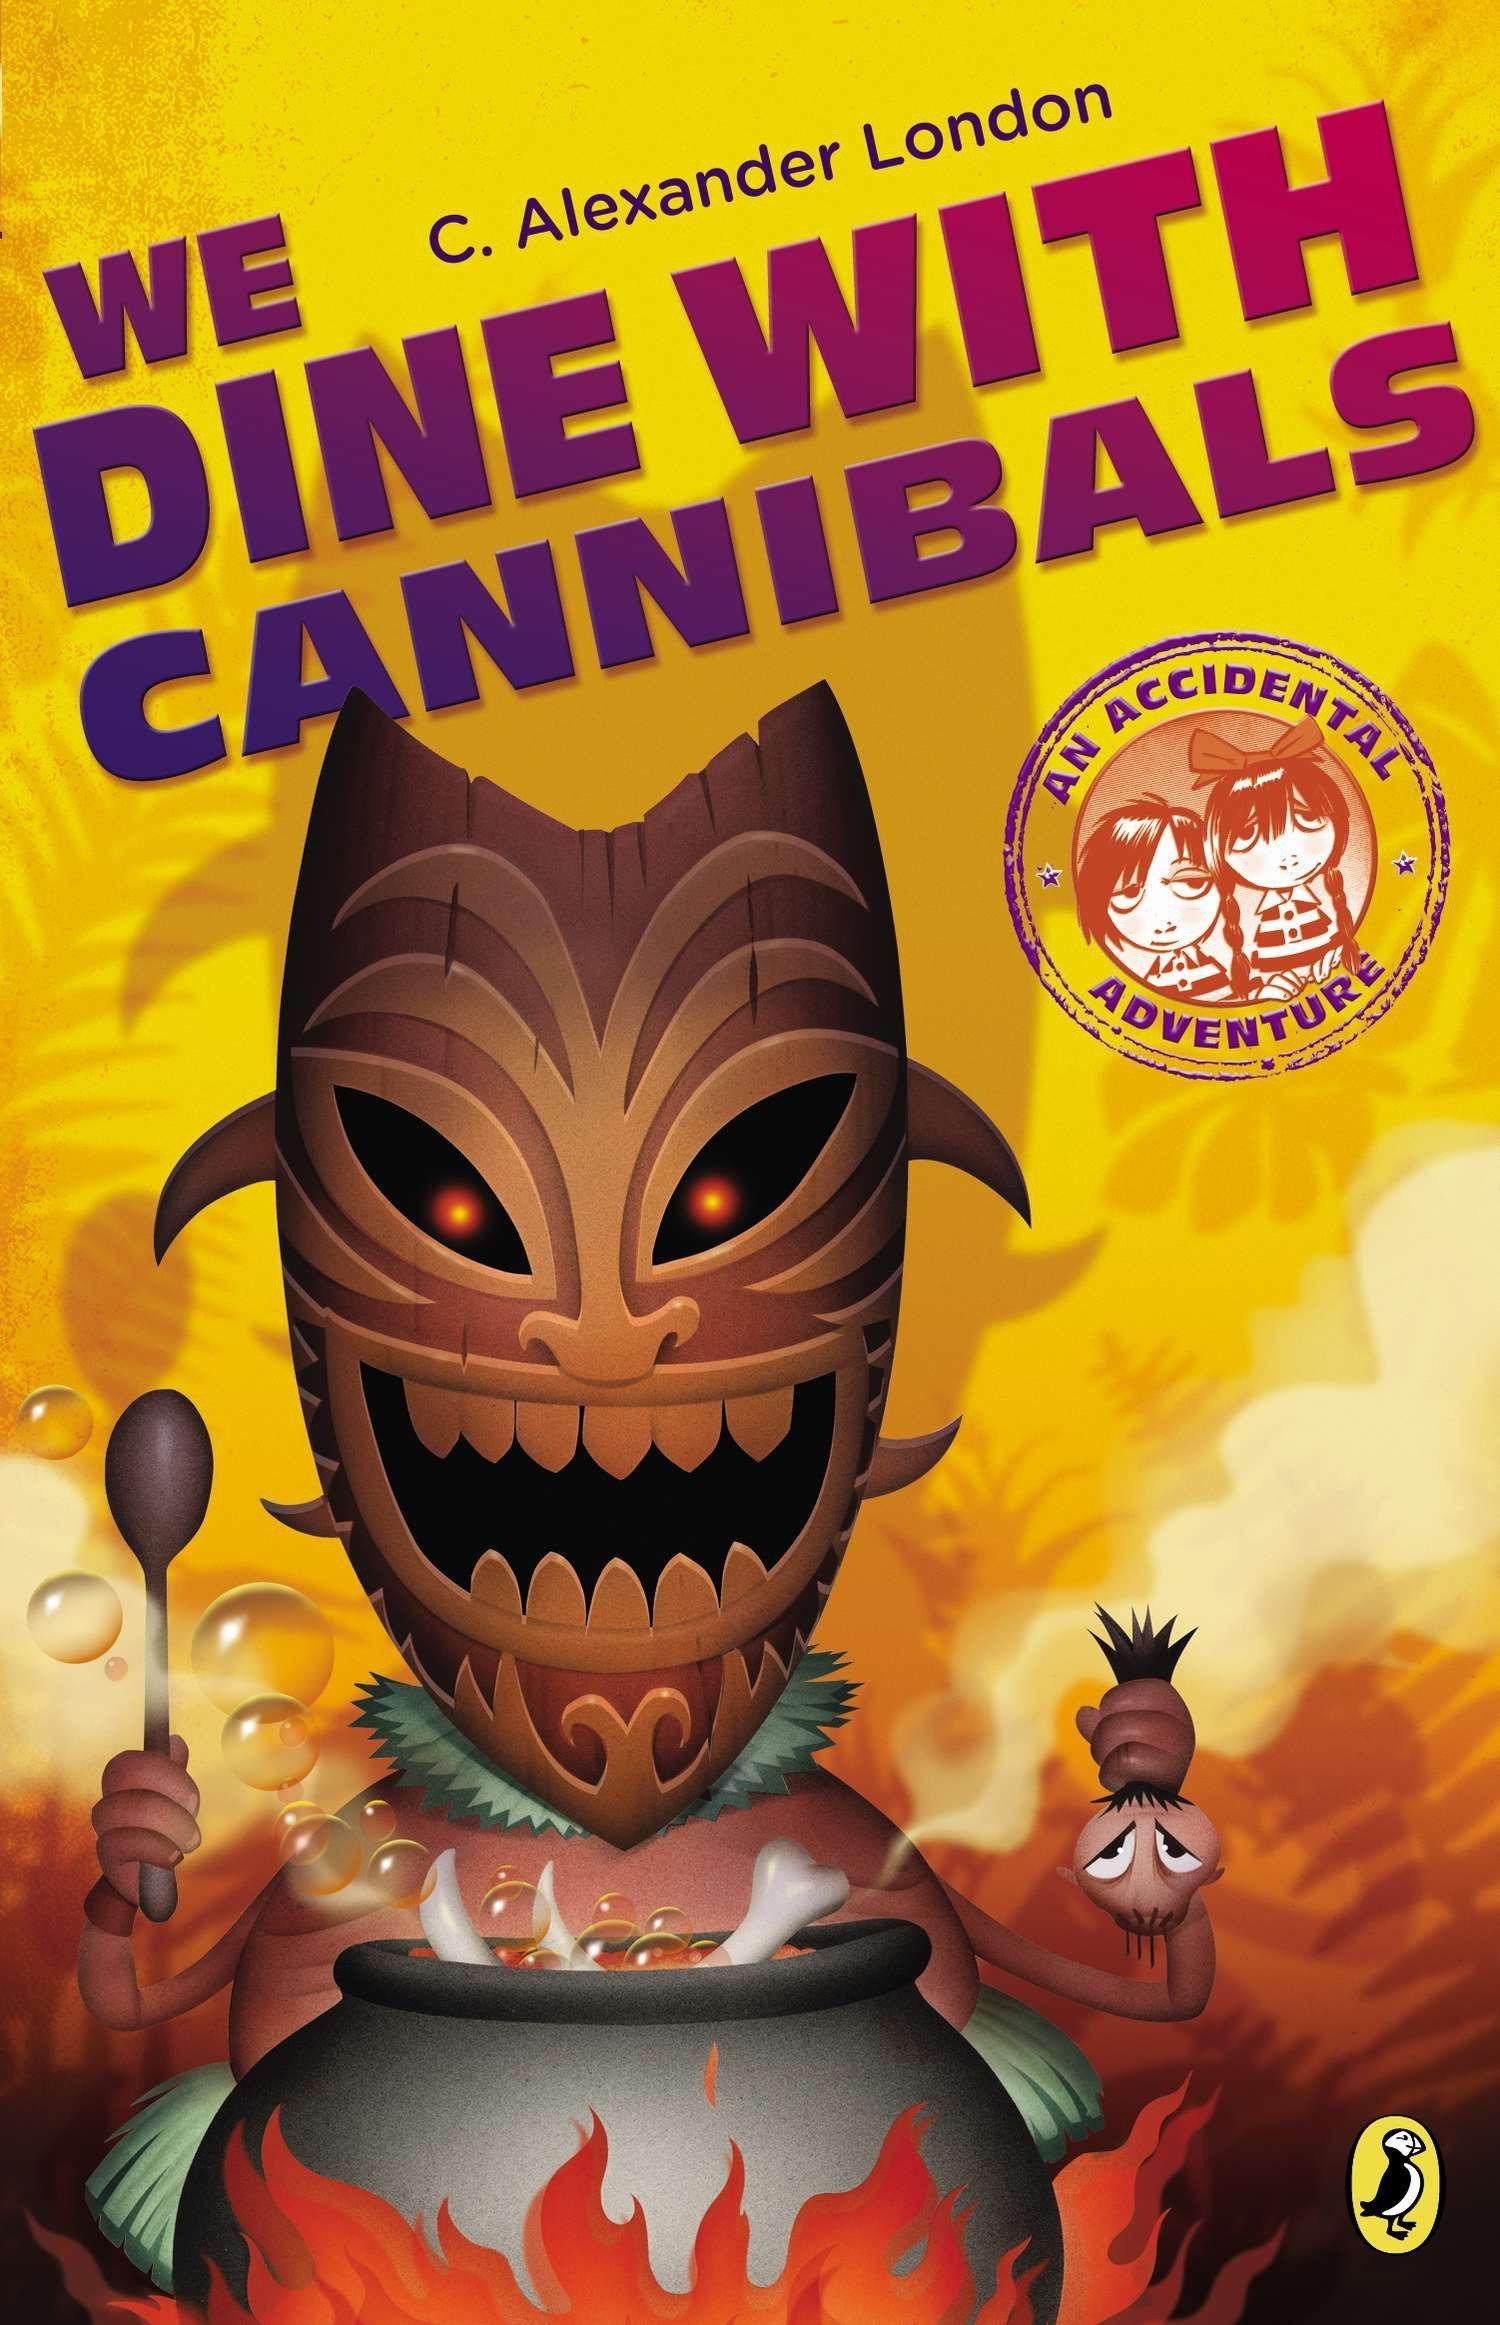 london-dine-cannibals.jpg